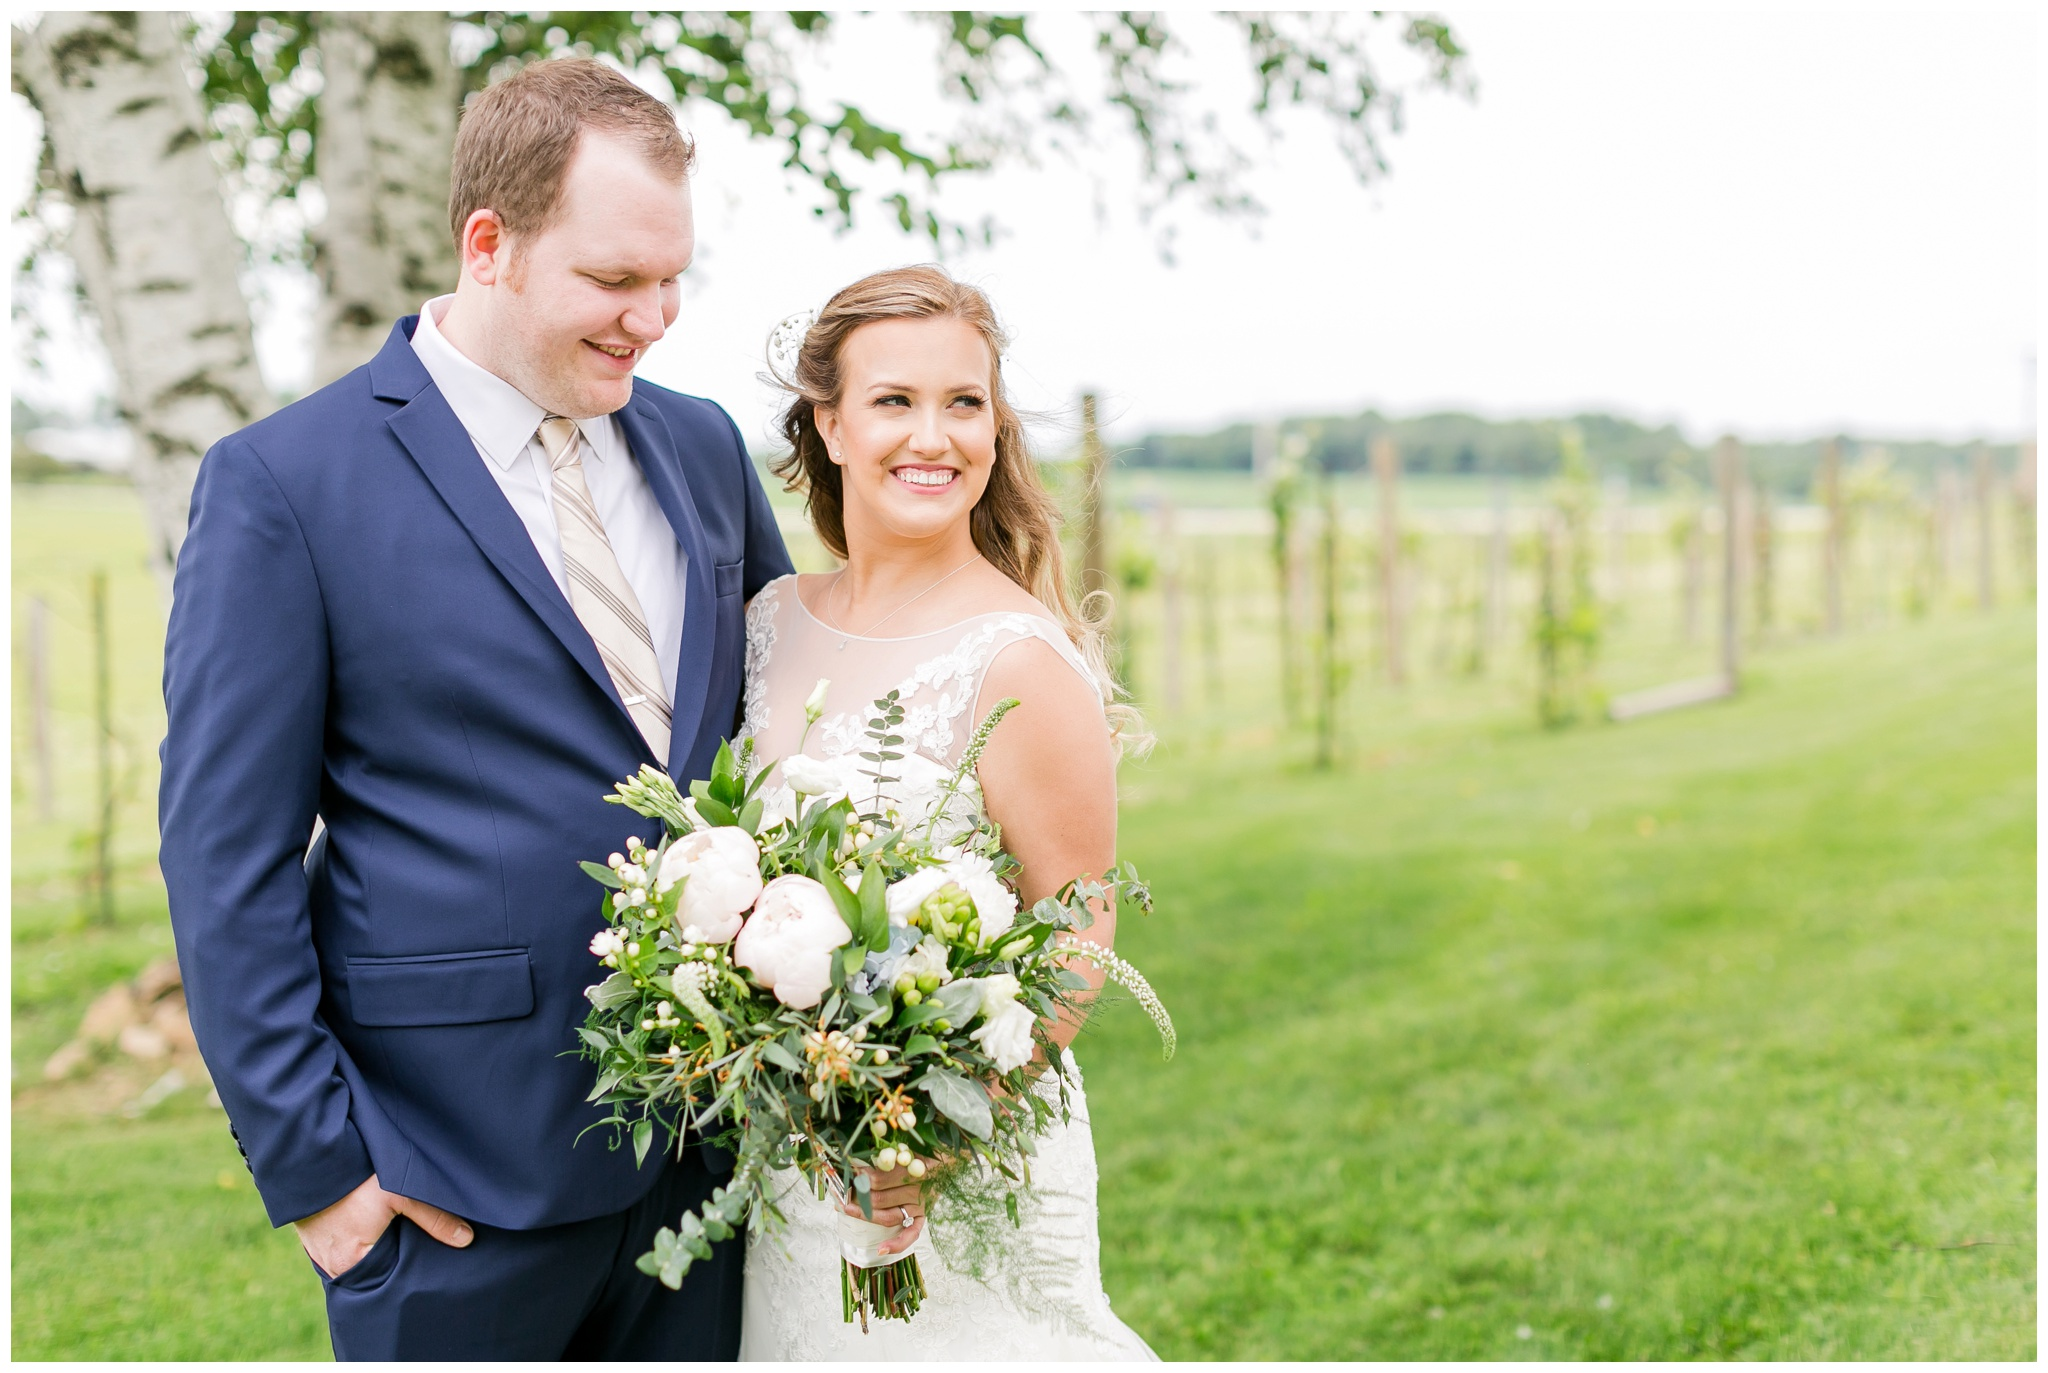 over_the_vines_wedding_edgerton_wisconsin_wedding_caynay_photo_3985.jpg